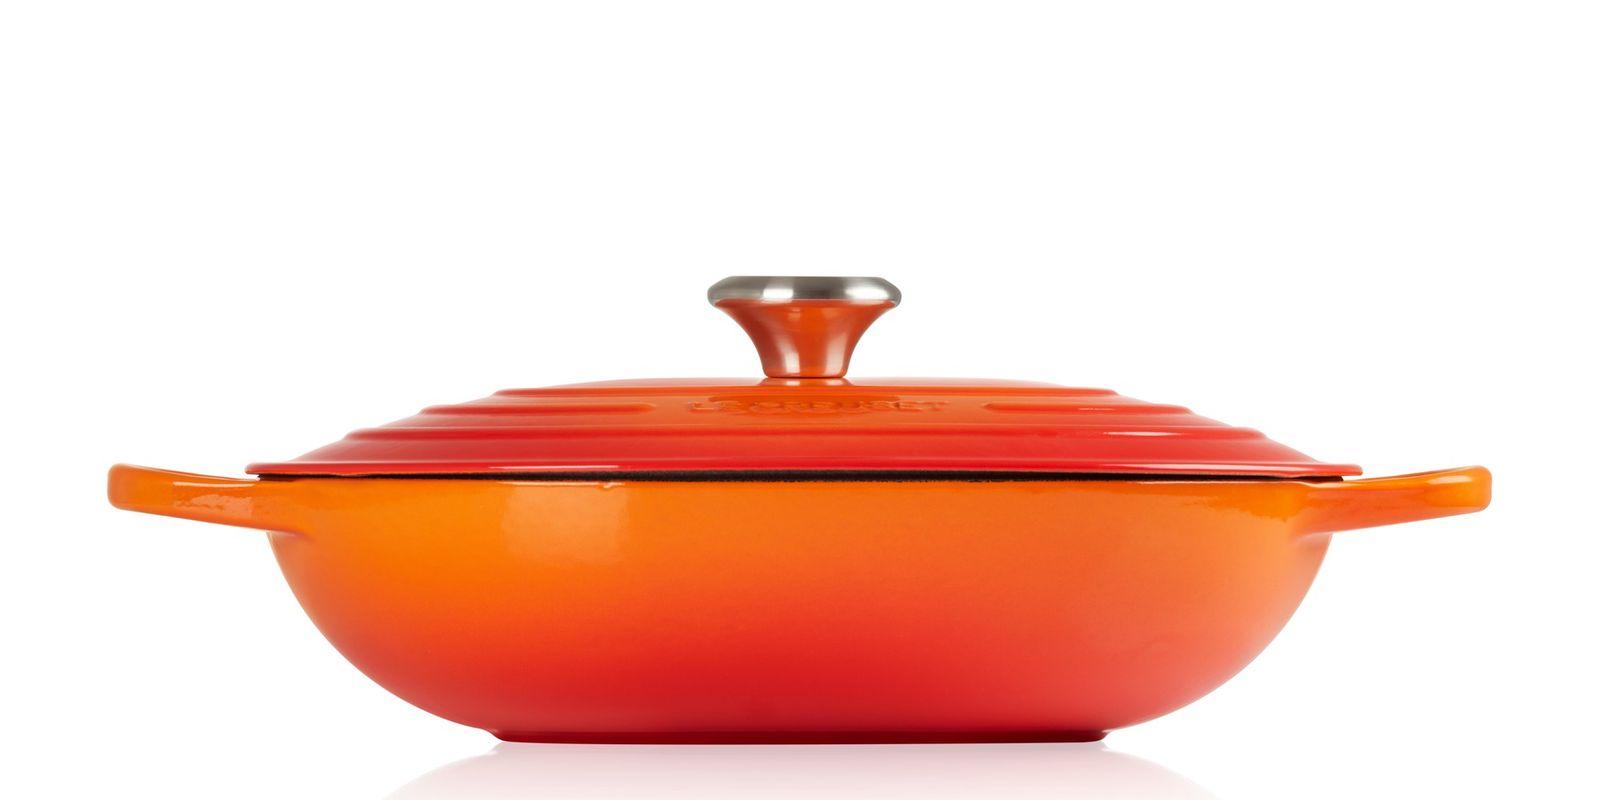 le_creuset_braadslede_oranje